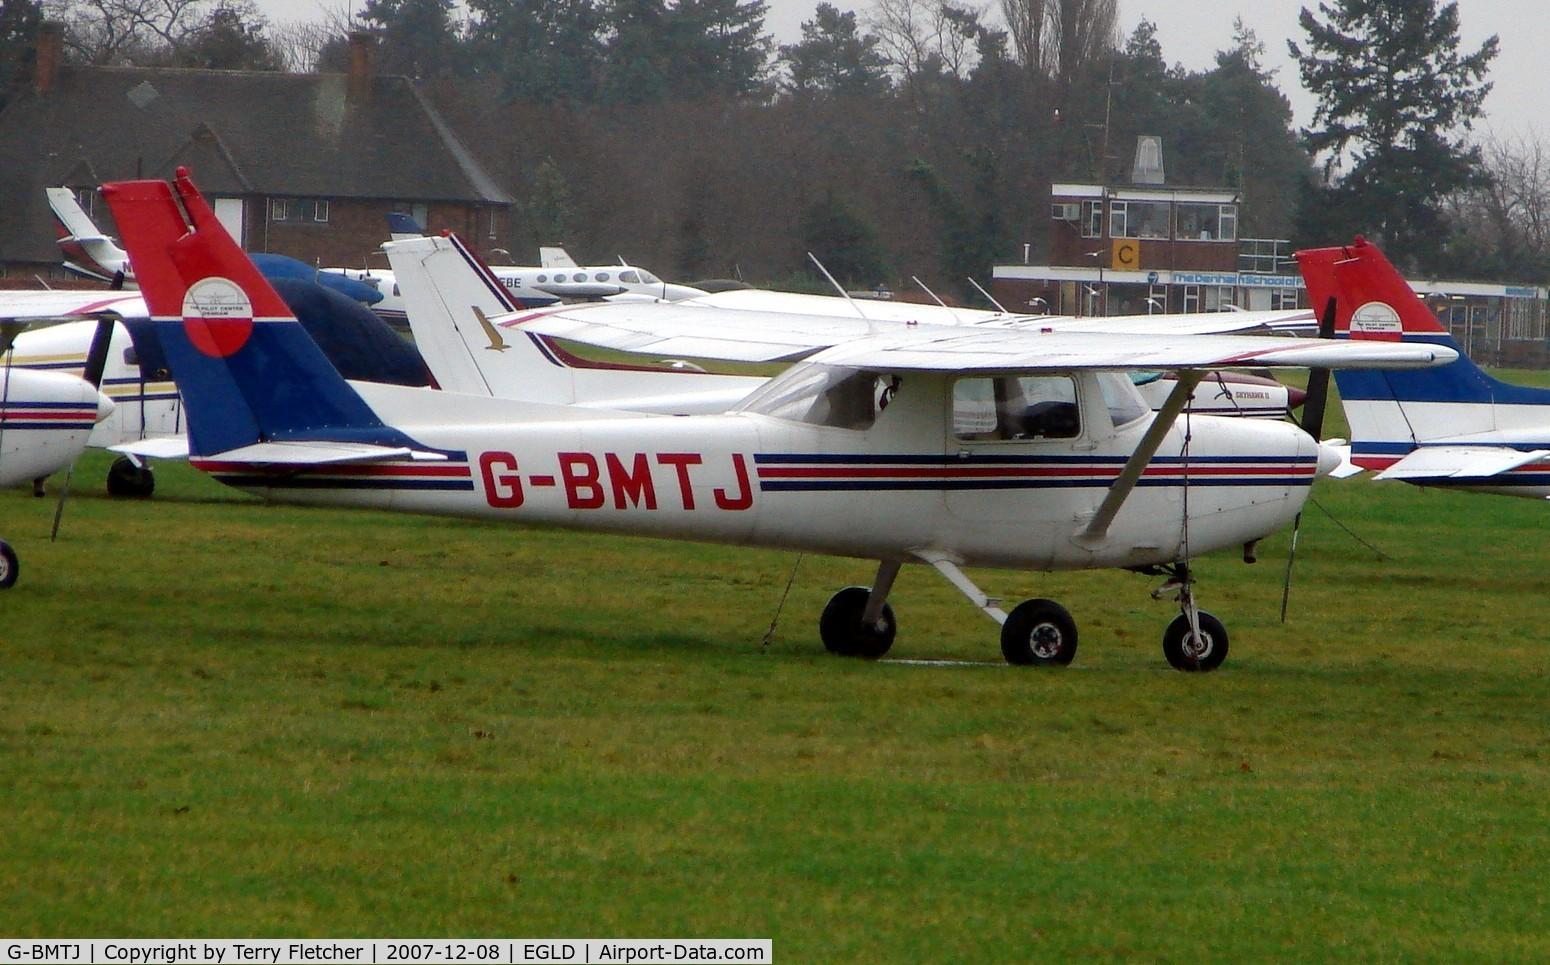 G-BMTJ, 1981 Cessna 152 C/N 152-85010, Cessna 152 at Denham